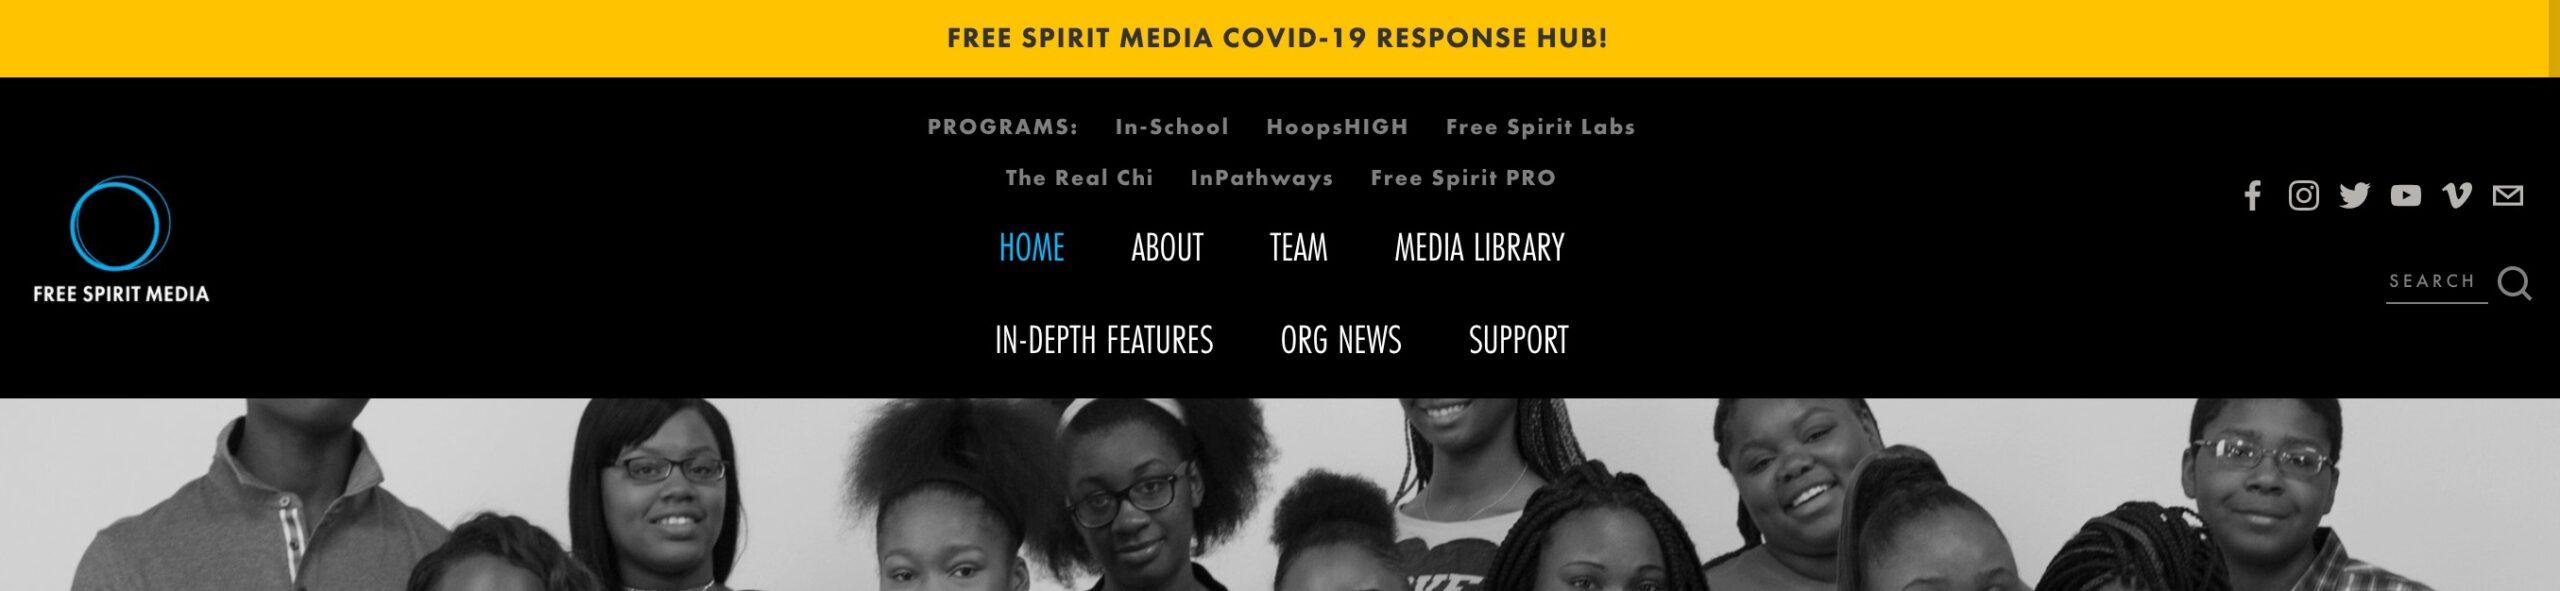 Message at top Free Spirit Media